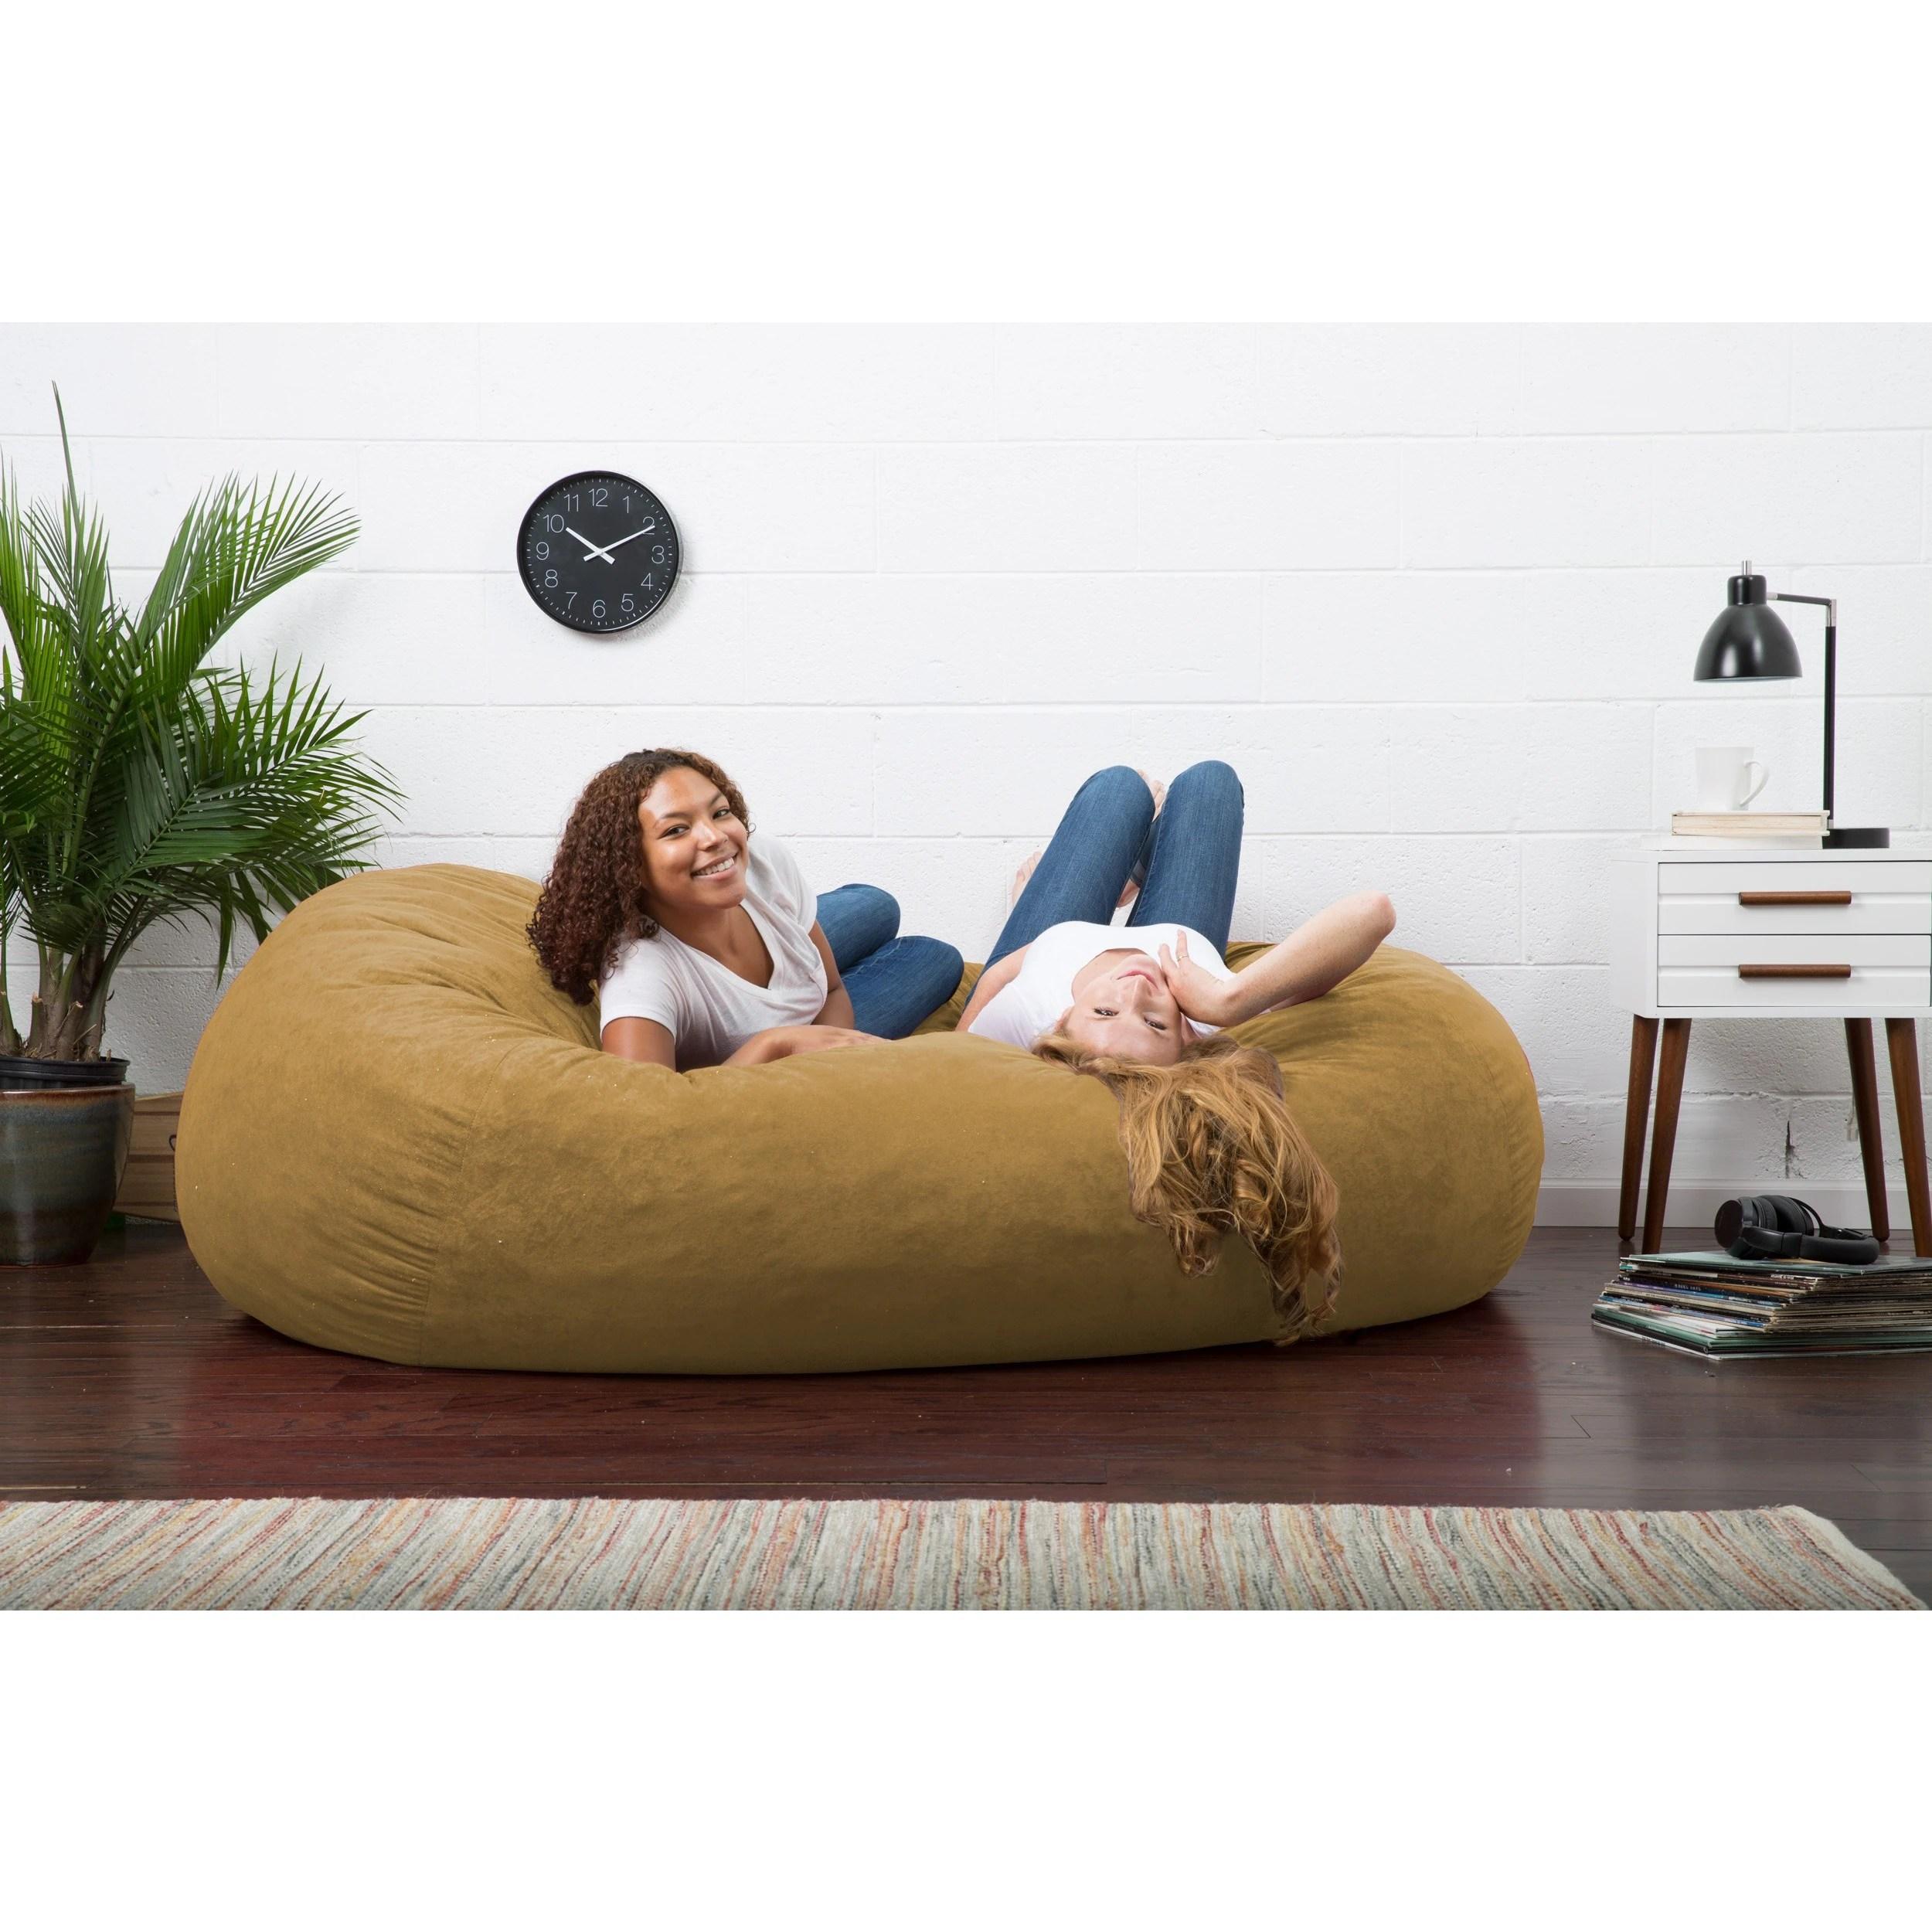 xxl fuf chair maccabee chairs costco shop big joe lounger free shipping today overstock com 8847087